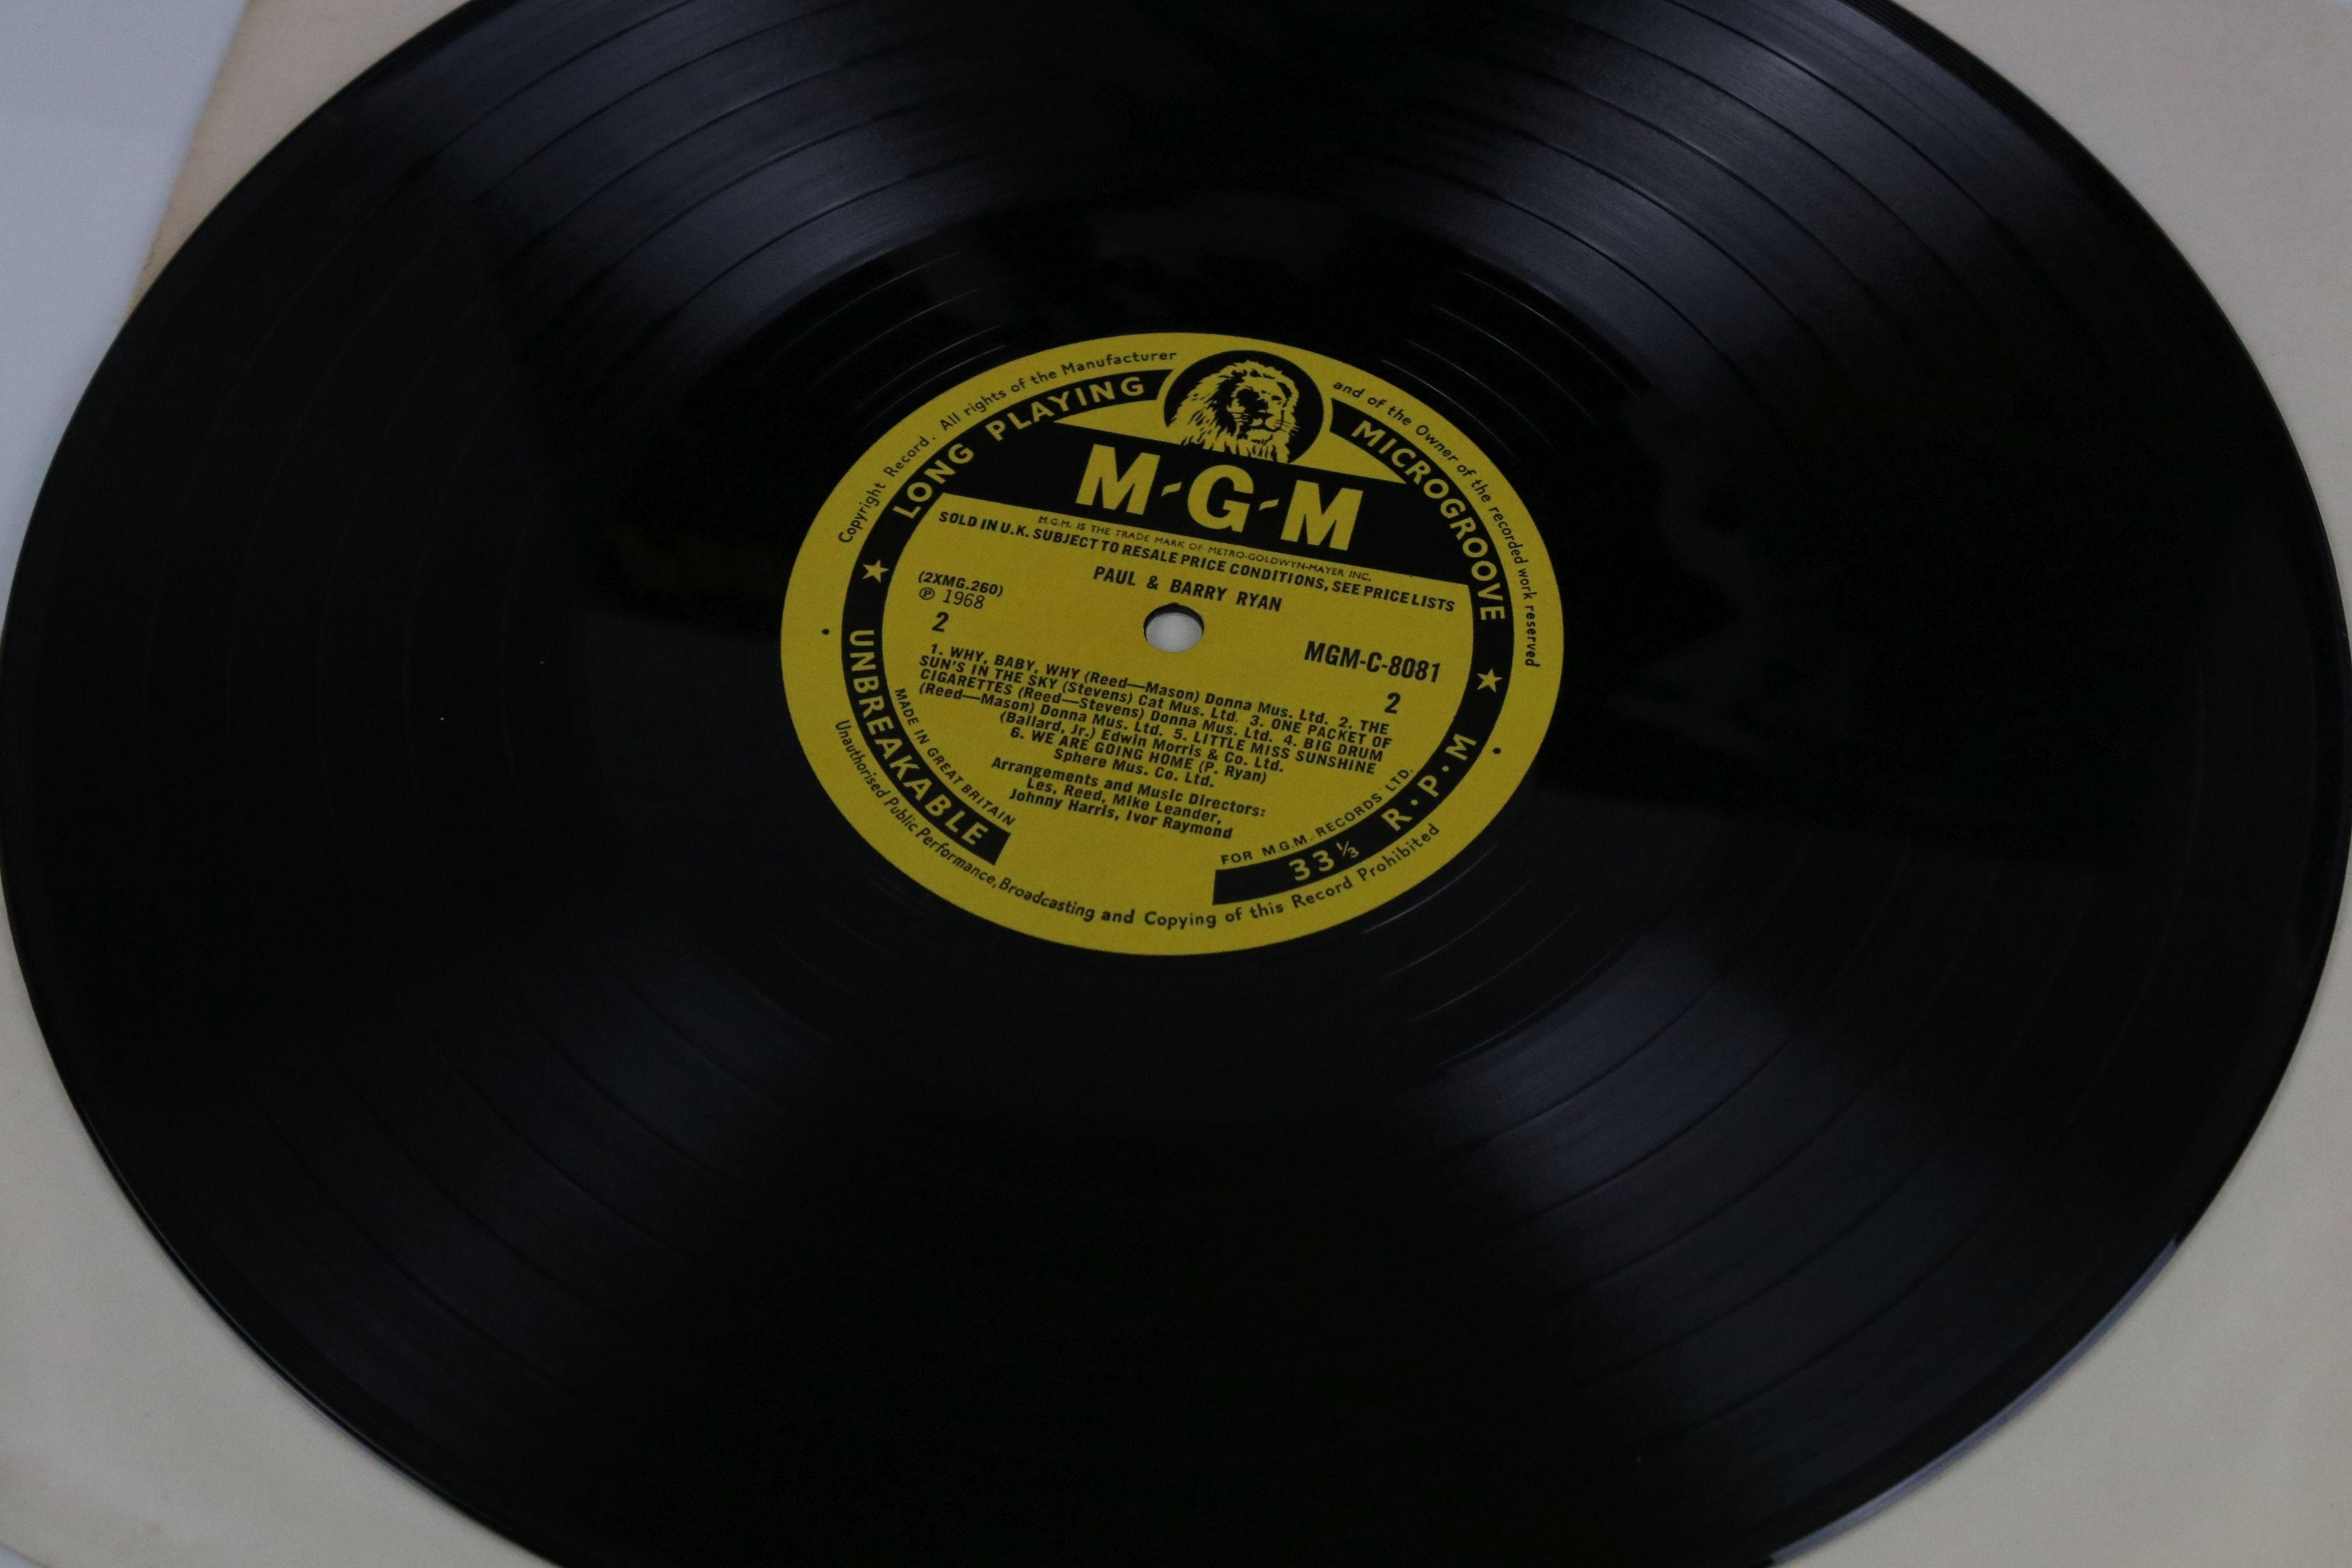 Vinyl - MOD/BEAT Paul & Barry Ryan self titled LP on MGM C 8081, mono non laminated, flip back - Image 3 of 5